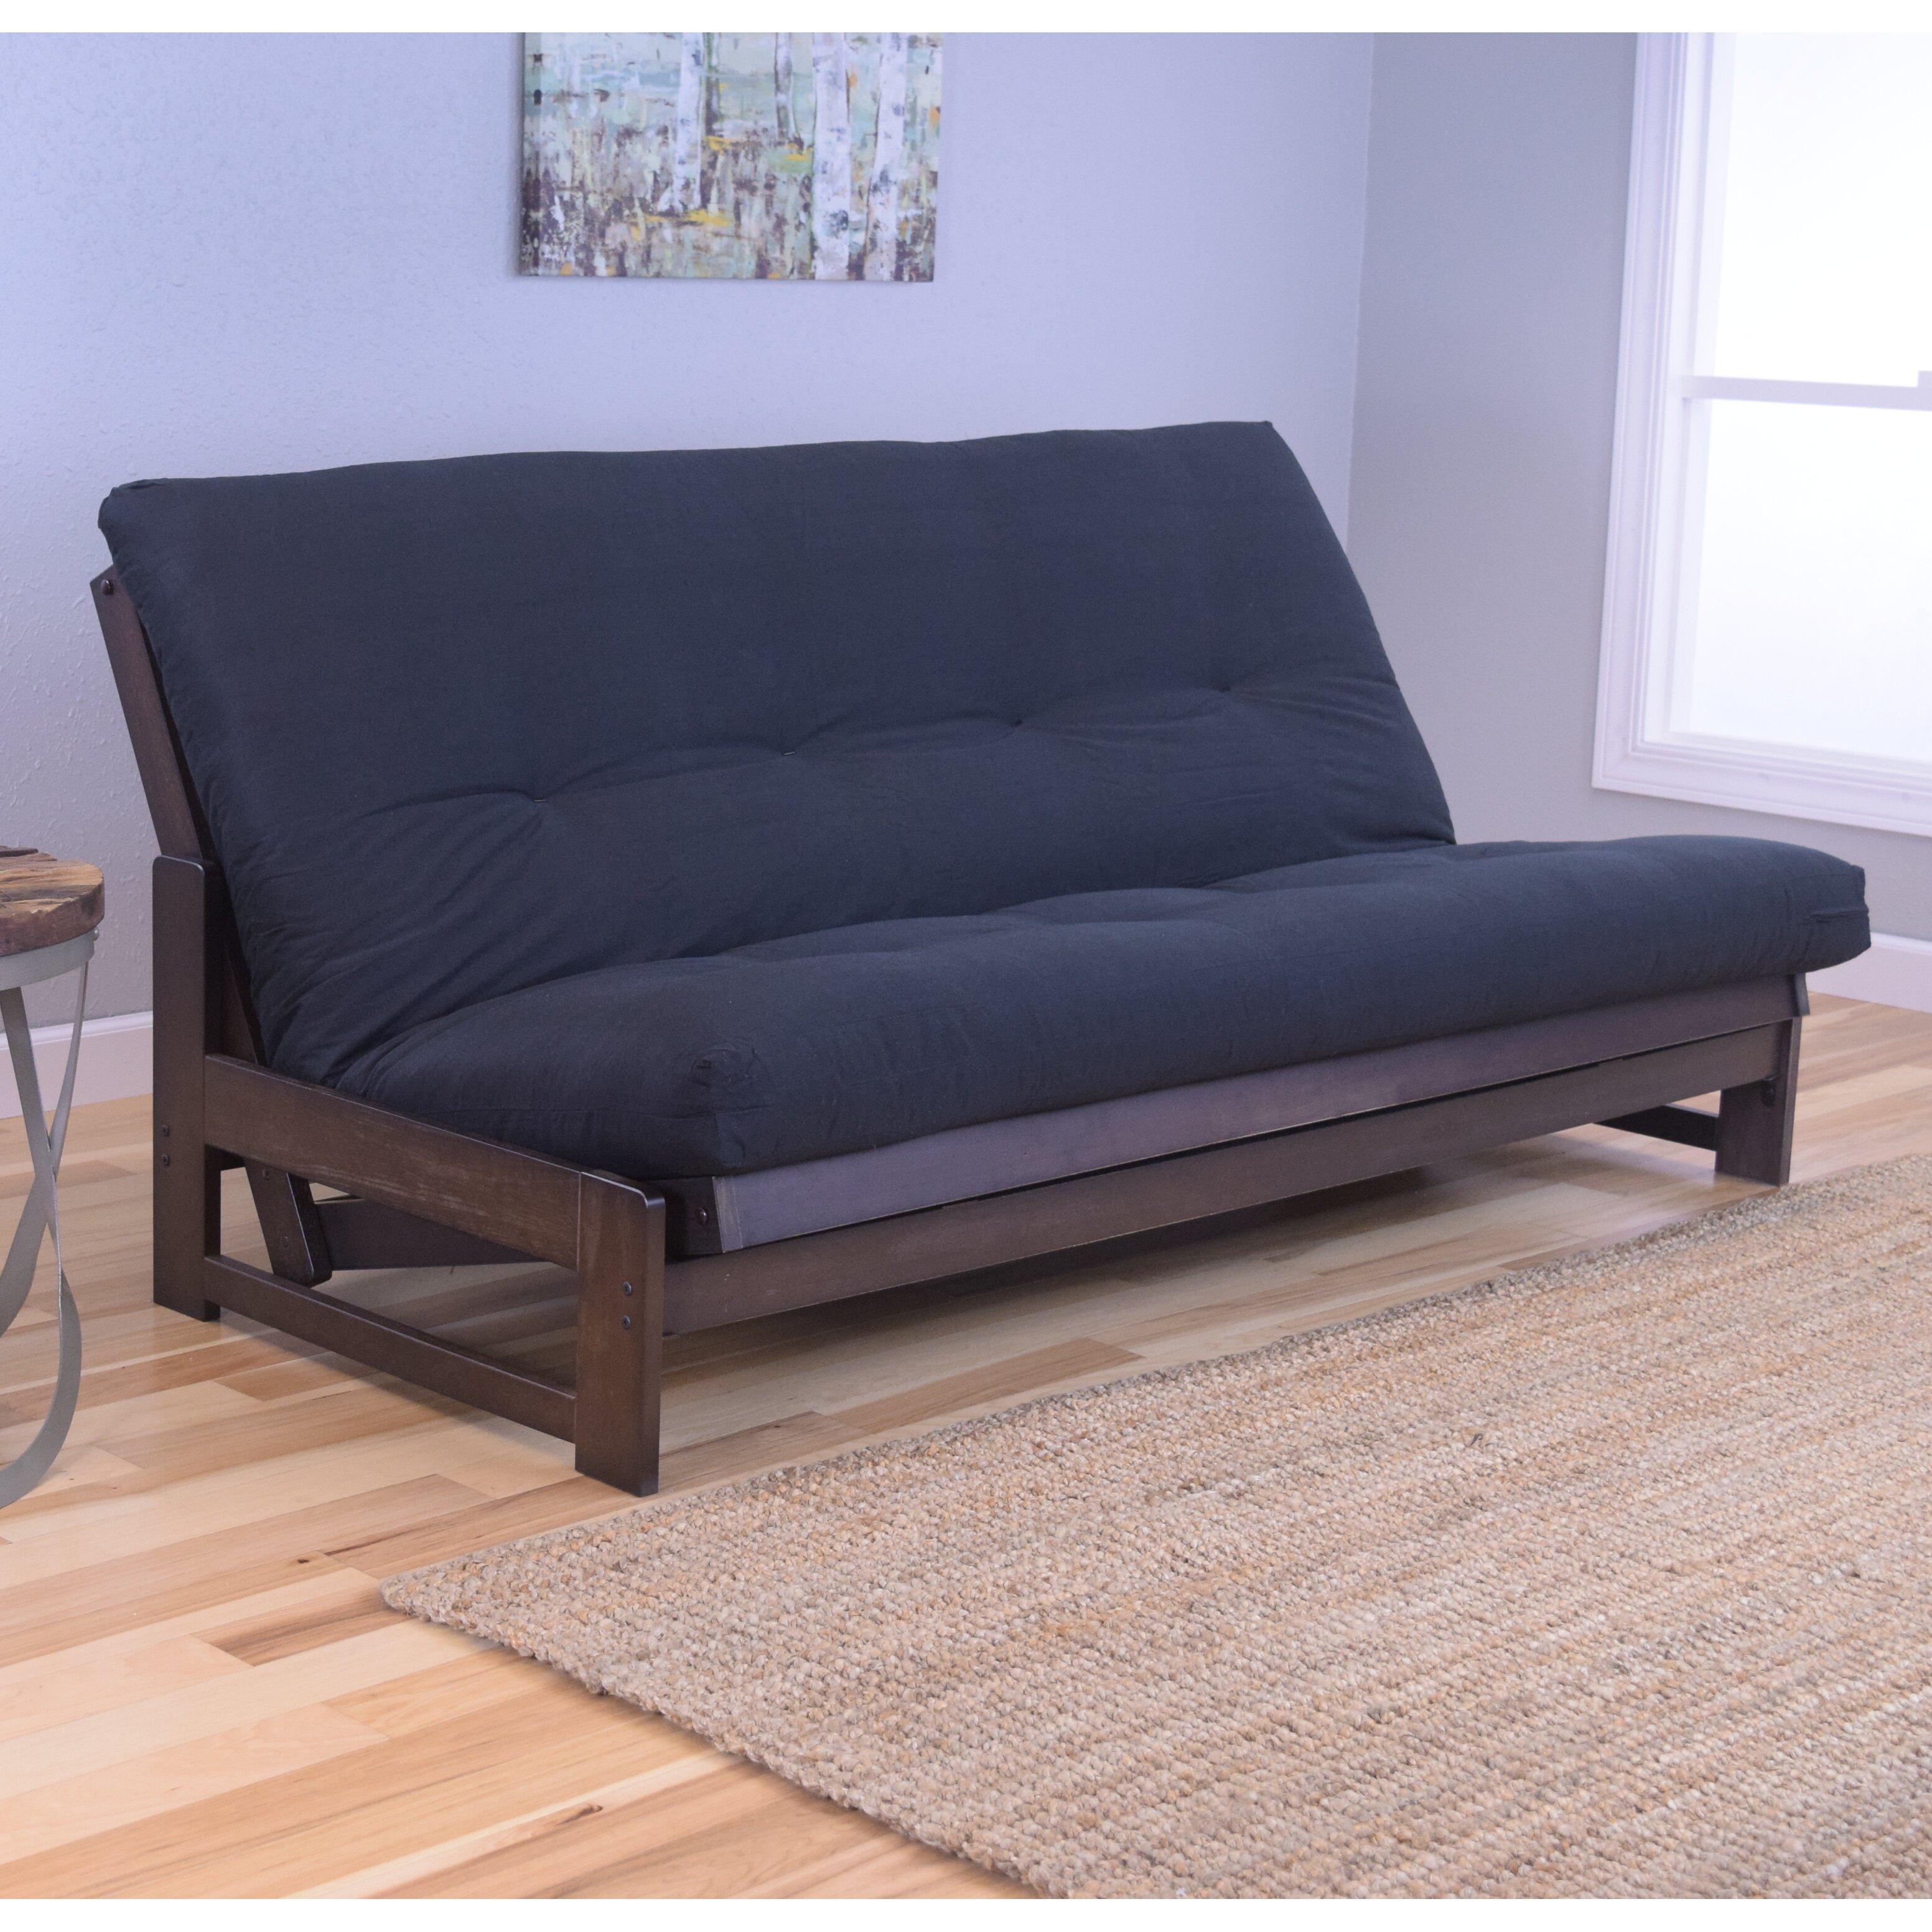 Kodiak furniture aspen futon and mattress reviews wayfair for Where to buy futon mattresses